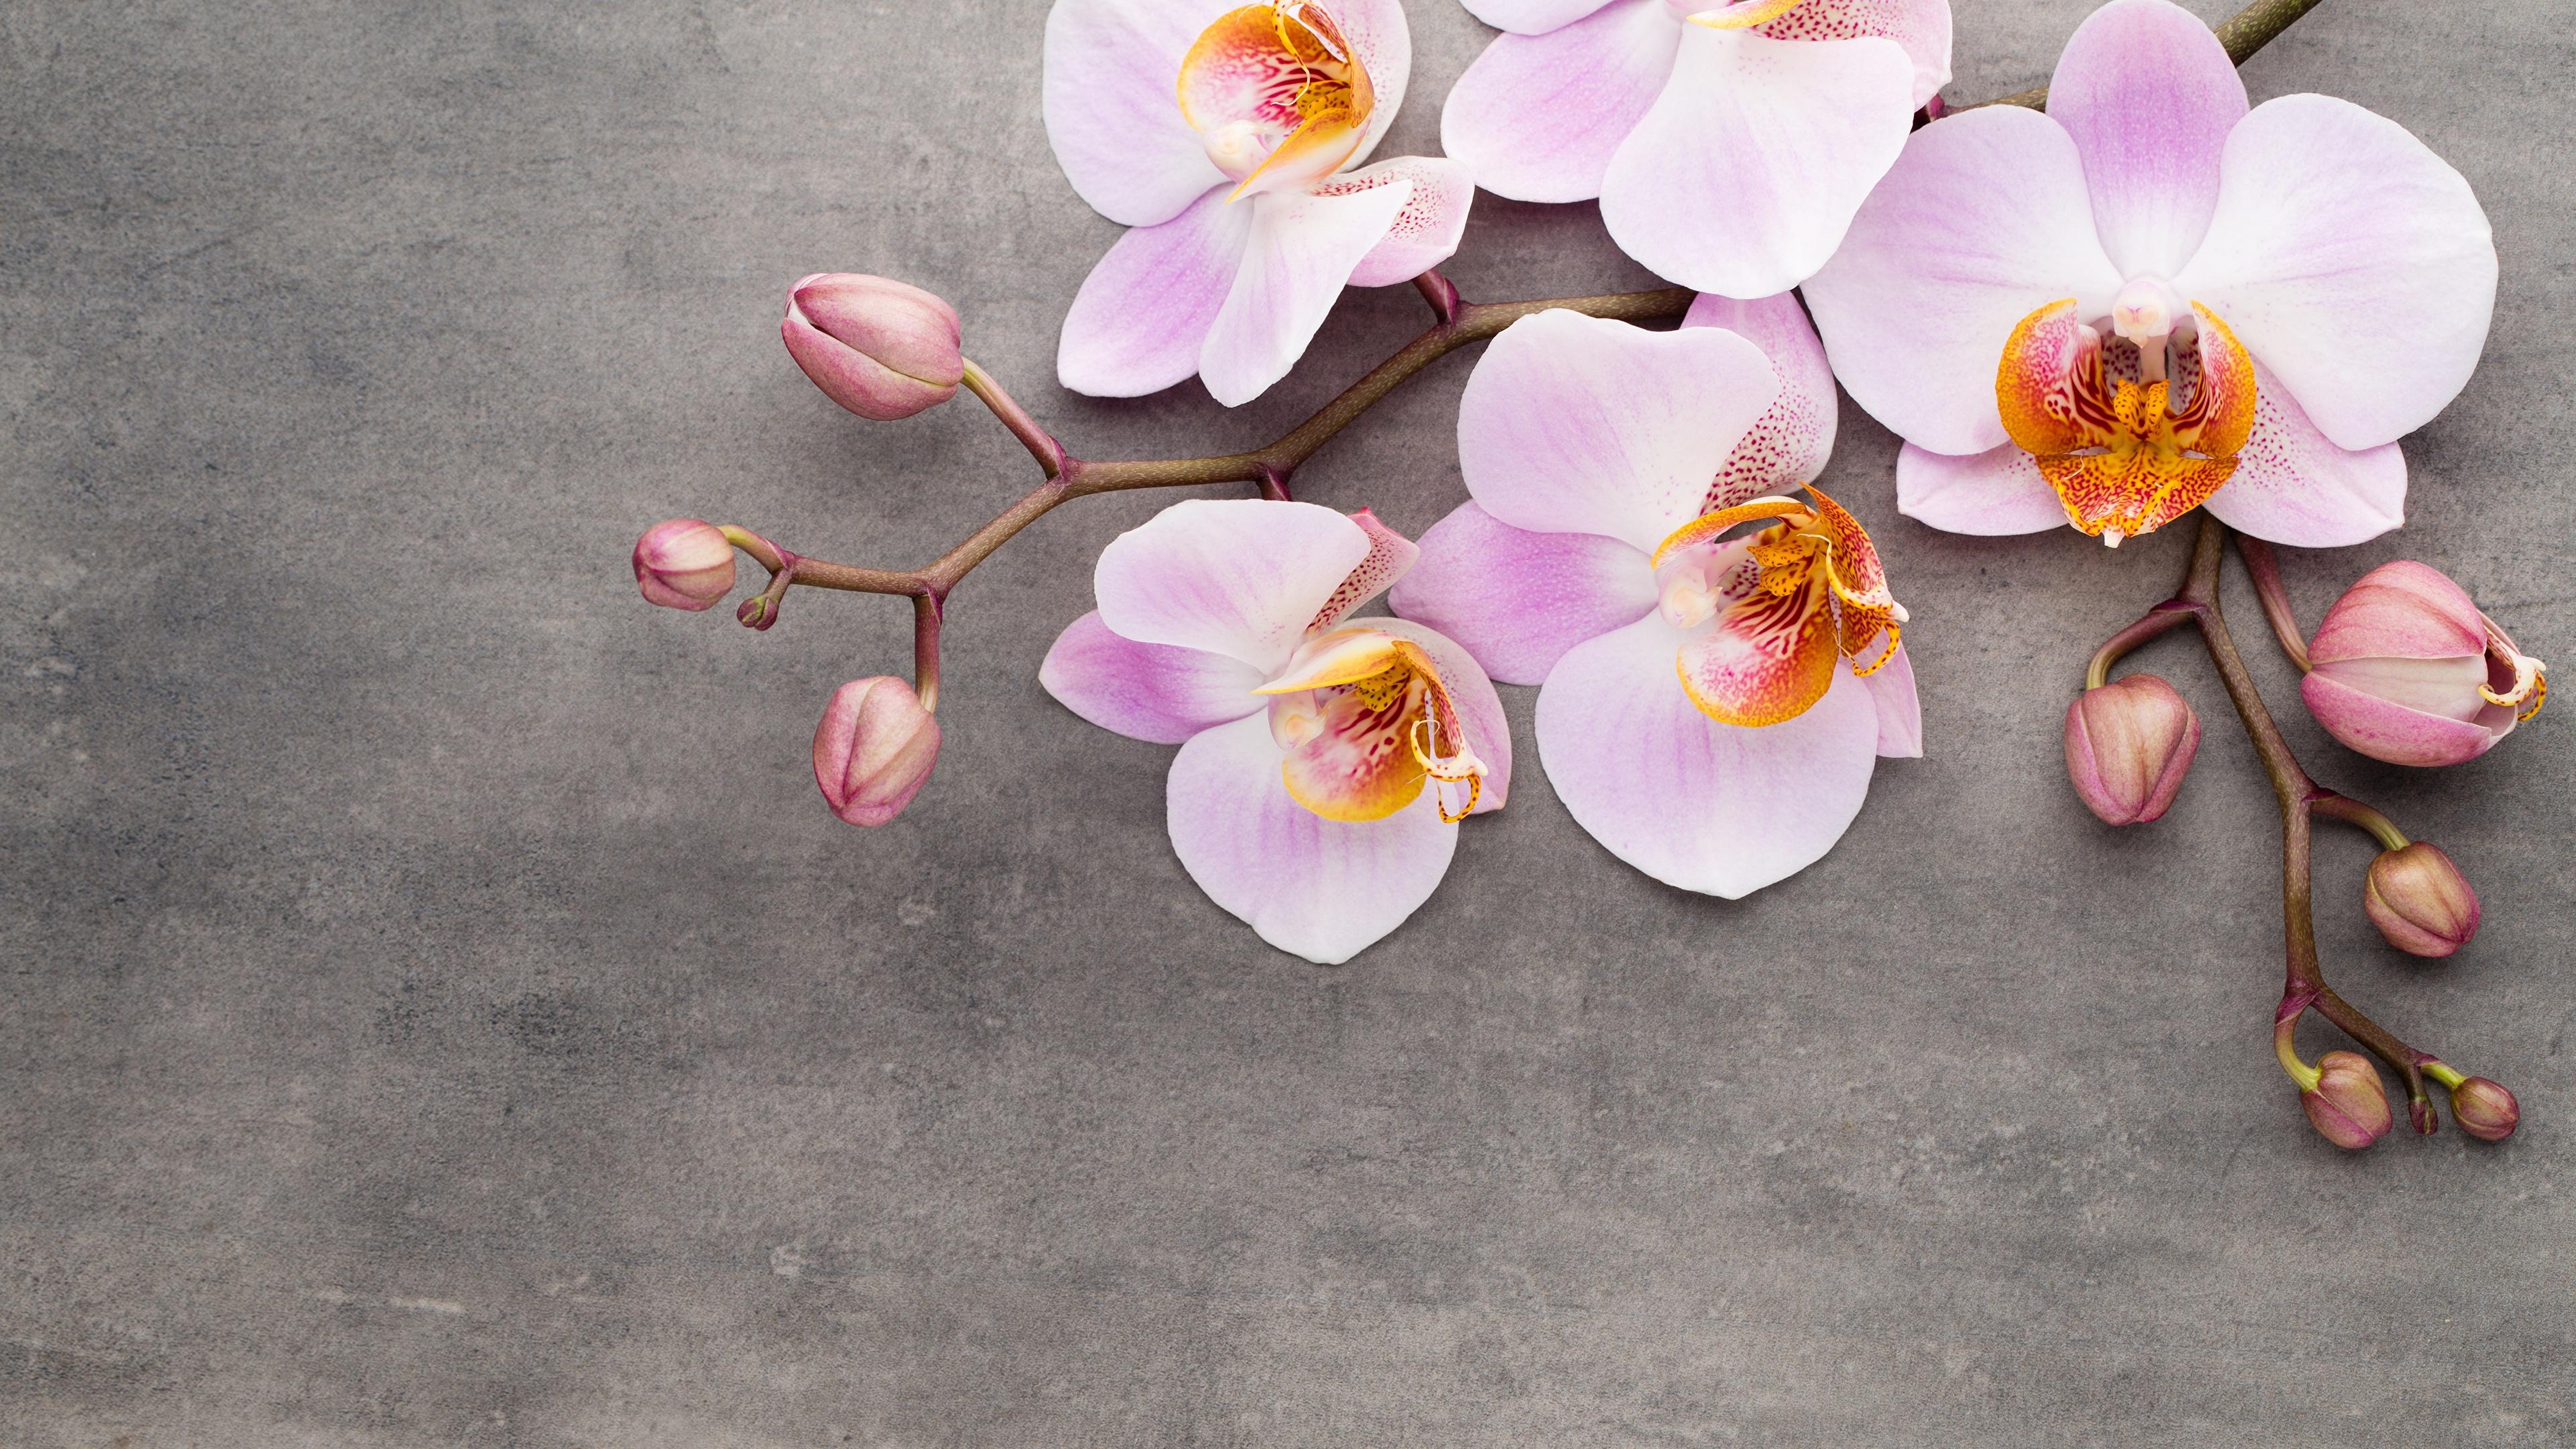 Fonds D Ecran 3840x2160 Orchidees Fleurs Telecharger Photo